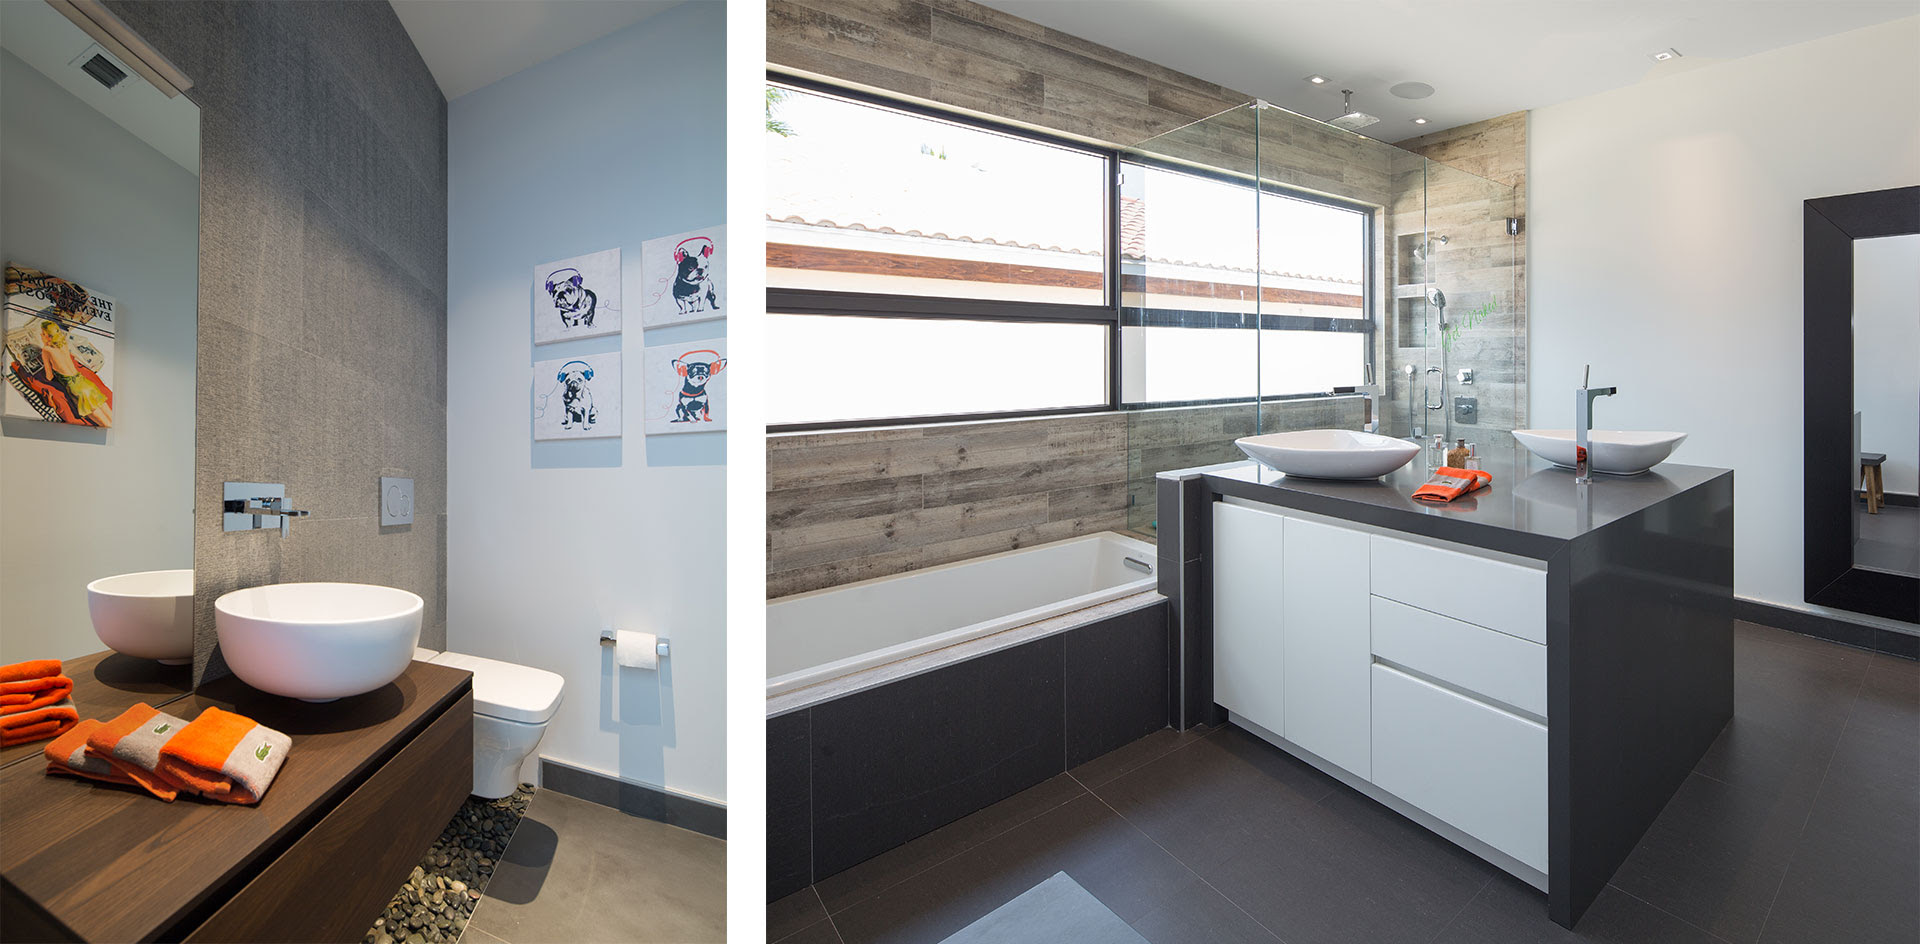 Boca Raton Interior Design View Bathroom Sdhstudio Architecture